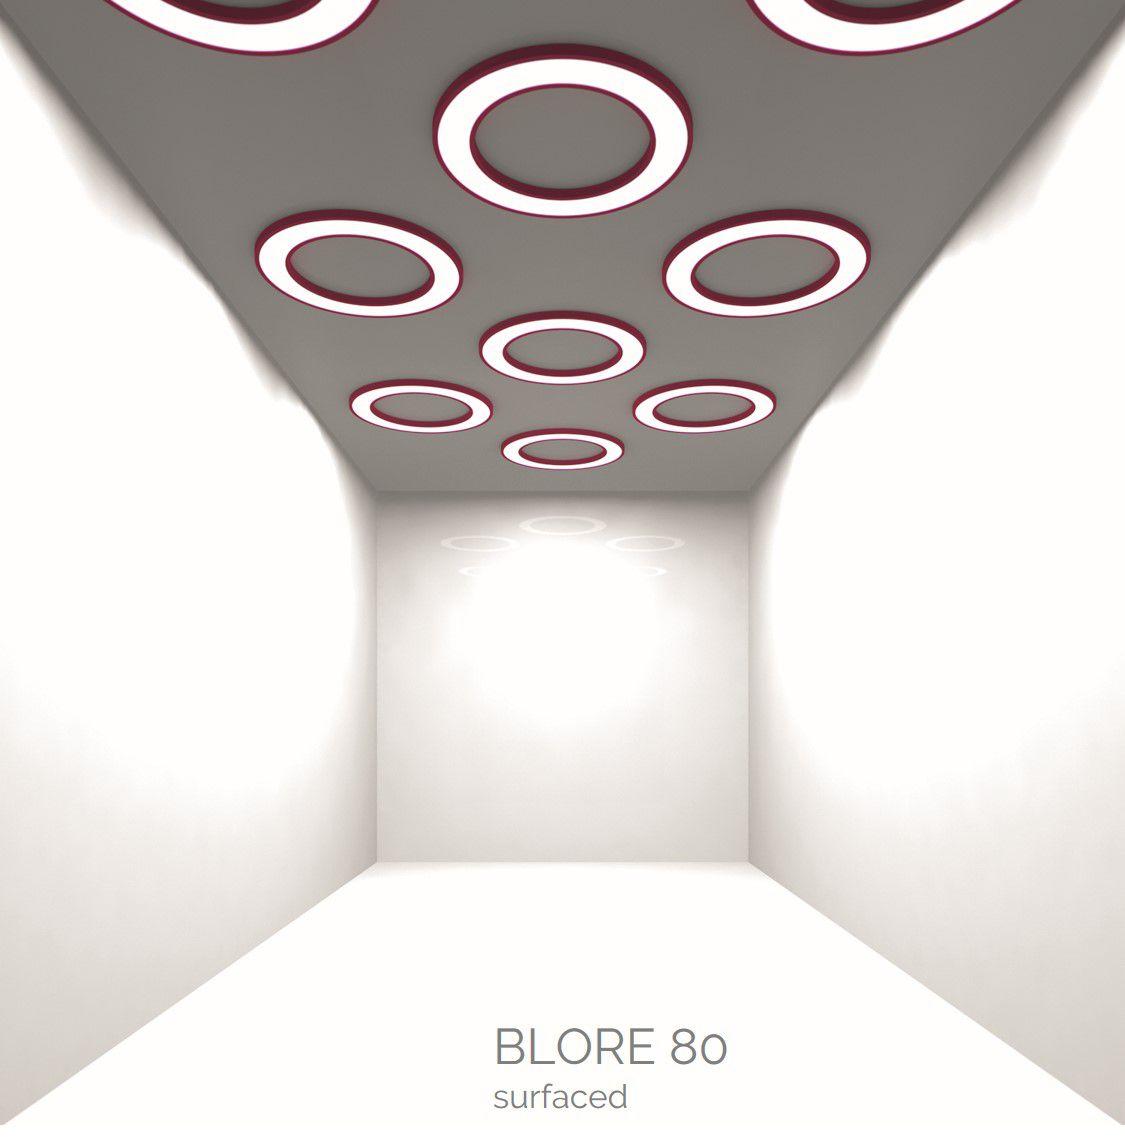 blore 80 surfaced luminaire round 1500x80mm 3000k 8915lm 105w fix